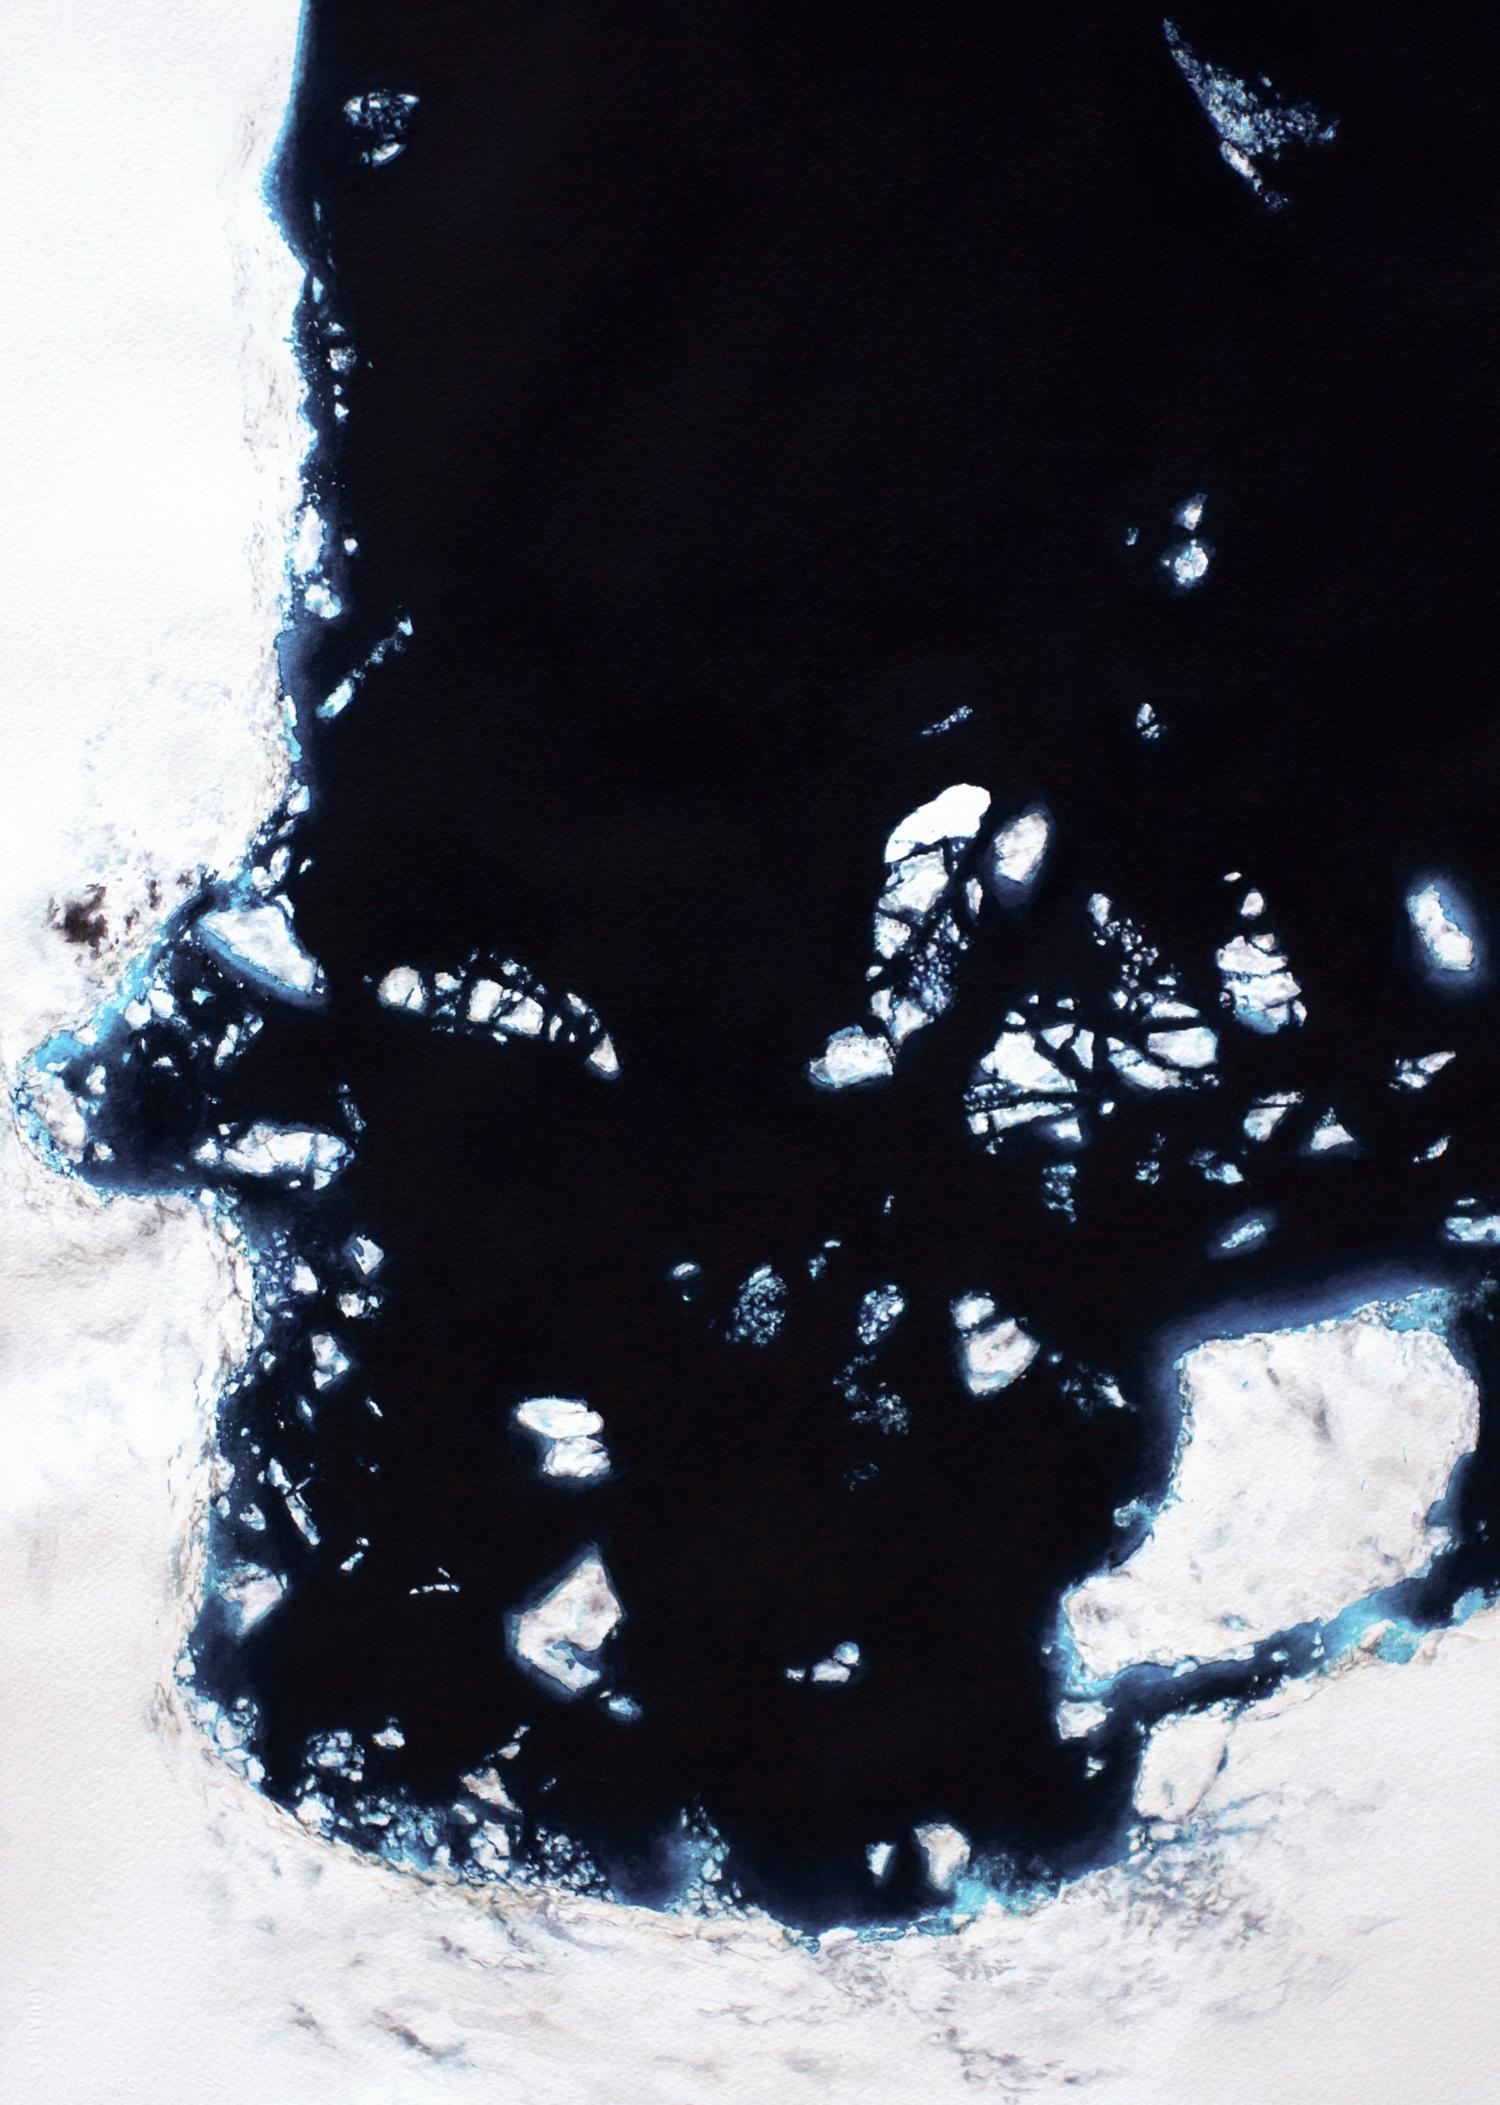 Coordenadas Antárticas IV  Acrílico / Papel, 70 x 50 cm, 2012   Antarctic Coordinates IV  Acrylic / Paper, 2' 3.5'' x 1' 7.7'', 2012